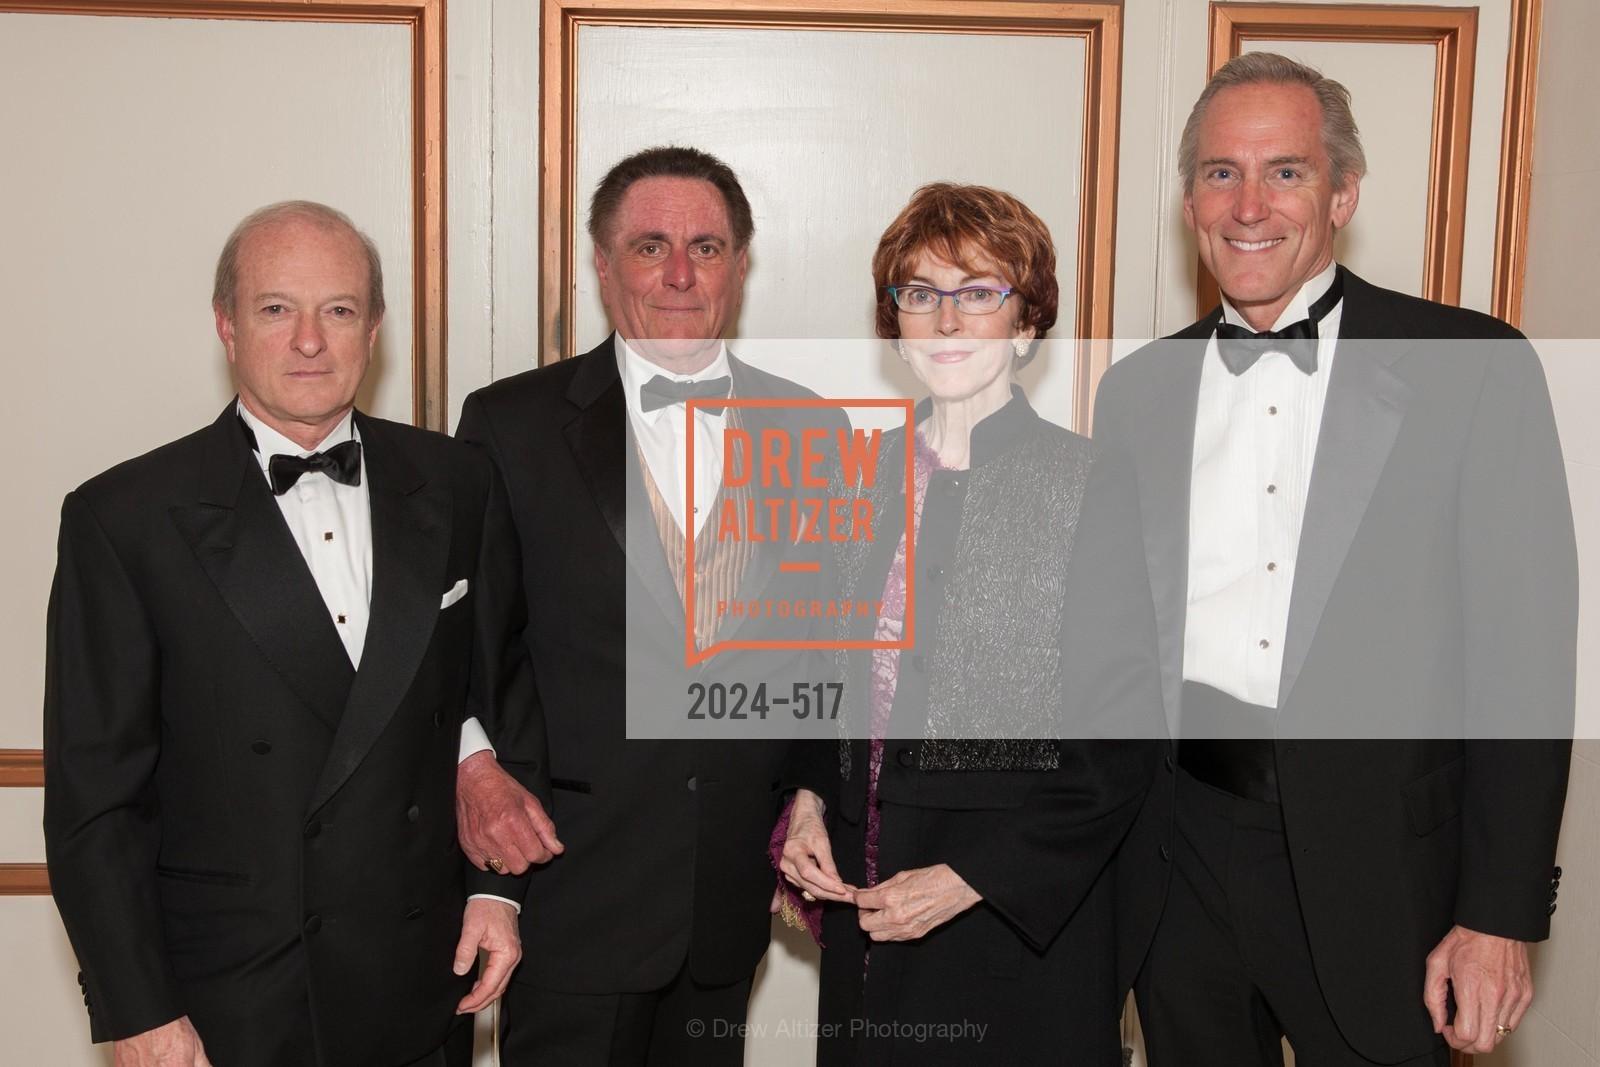 David Gorsulowsky, Ernest Mariotto, Lola Bugatto, Matthew Kanzler, SAN FRANCISCO OPERA GUILD Presents POPera, US. US, April 10th, 2014